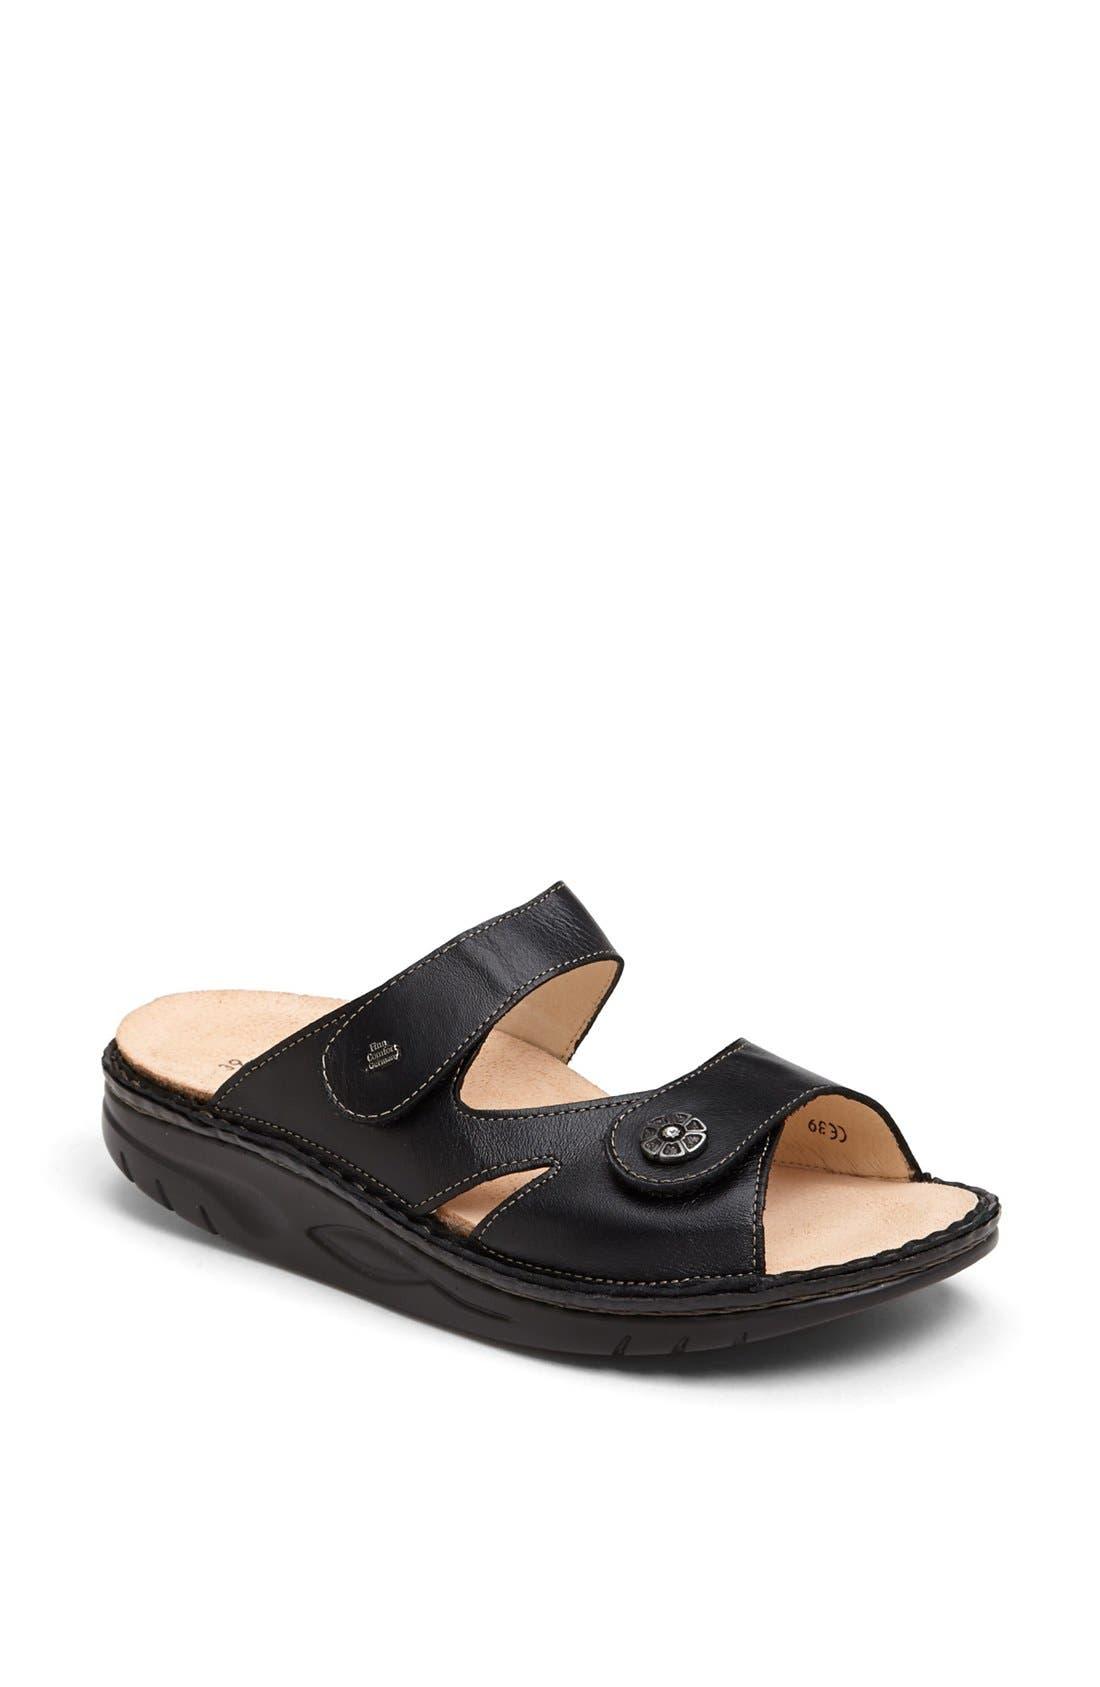 FINNAMIC by Finn Comfort 'Sanaa' Walking Sandal